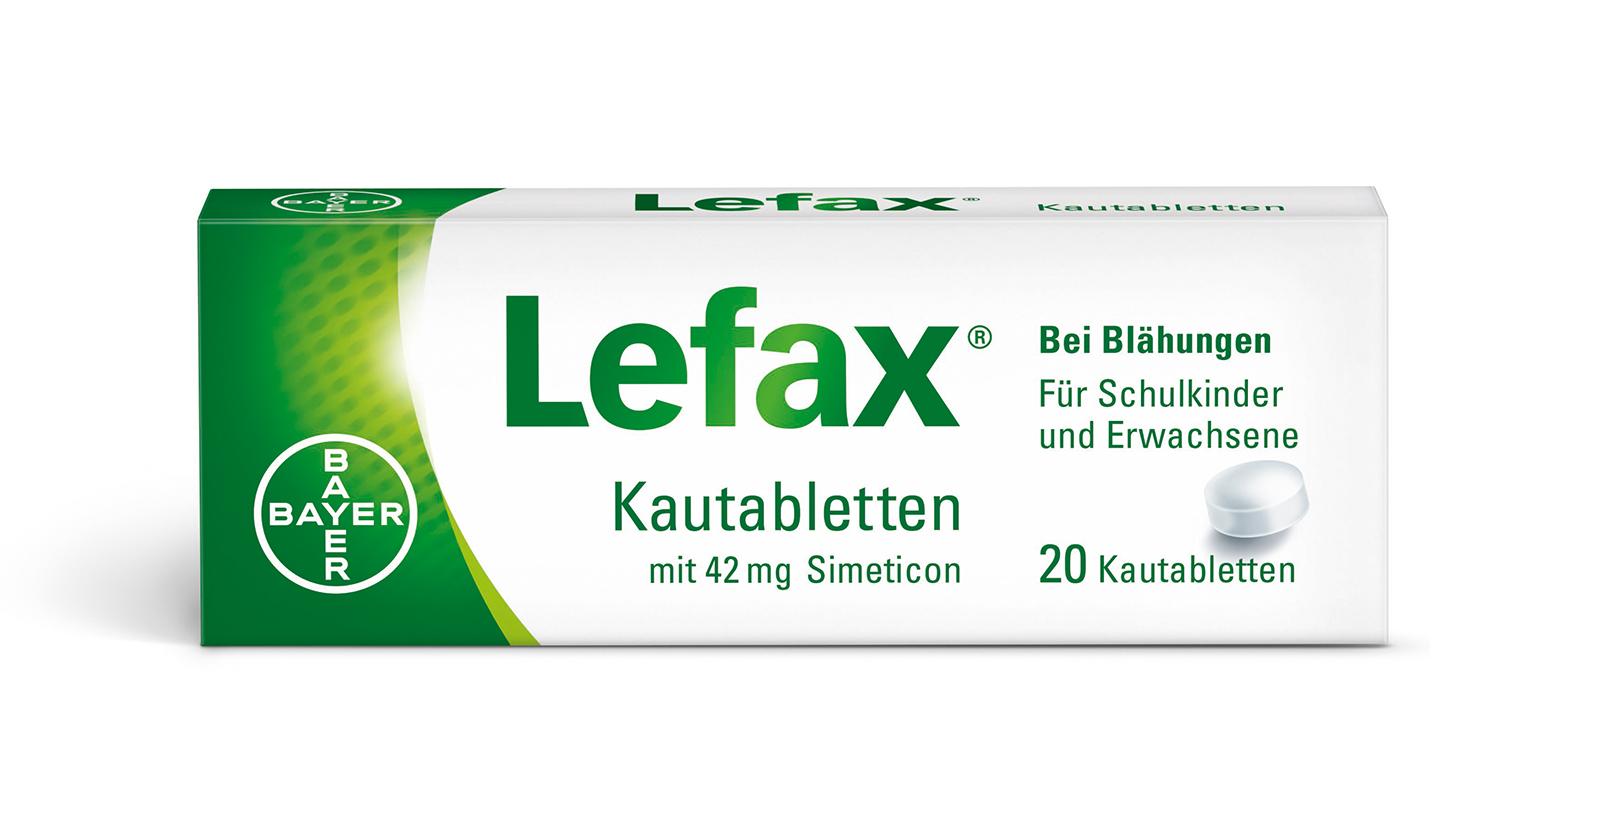 Packshot Lefax Kautabletten